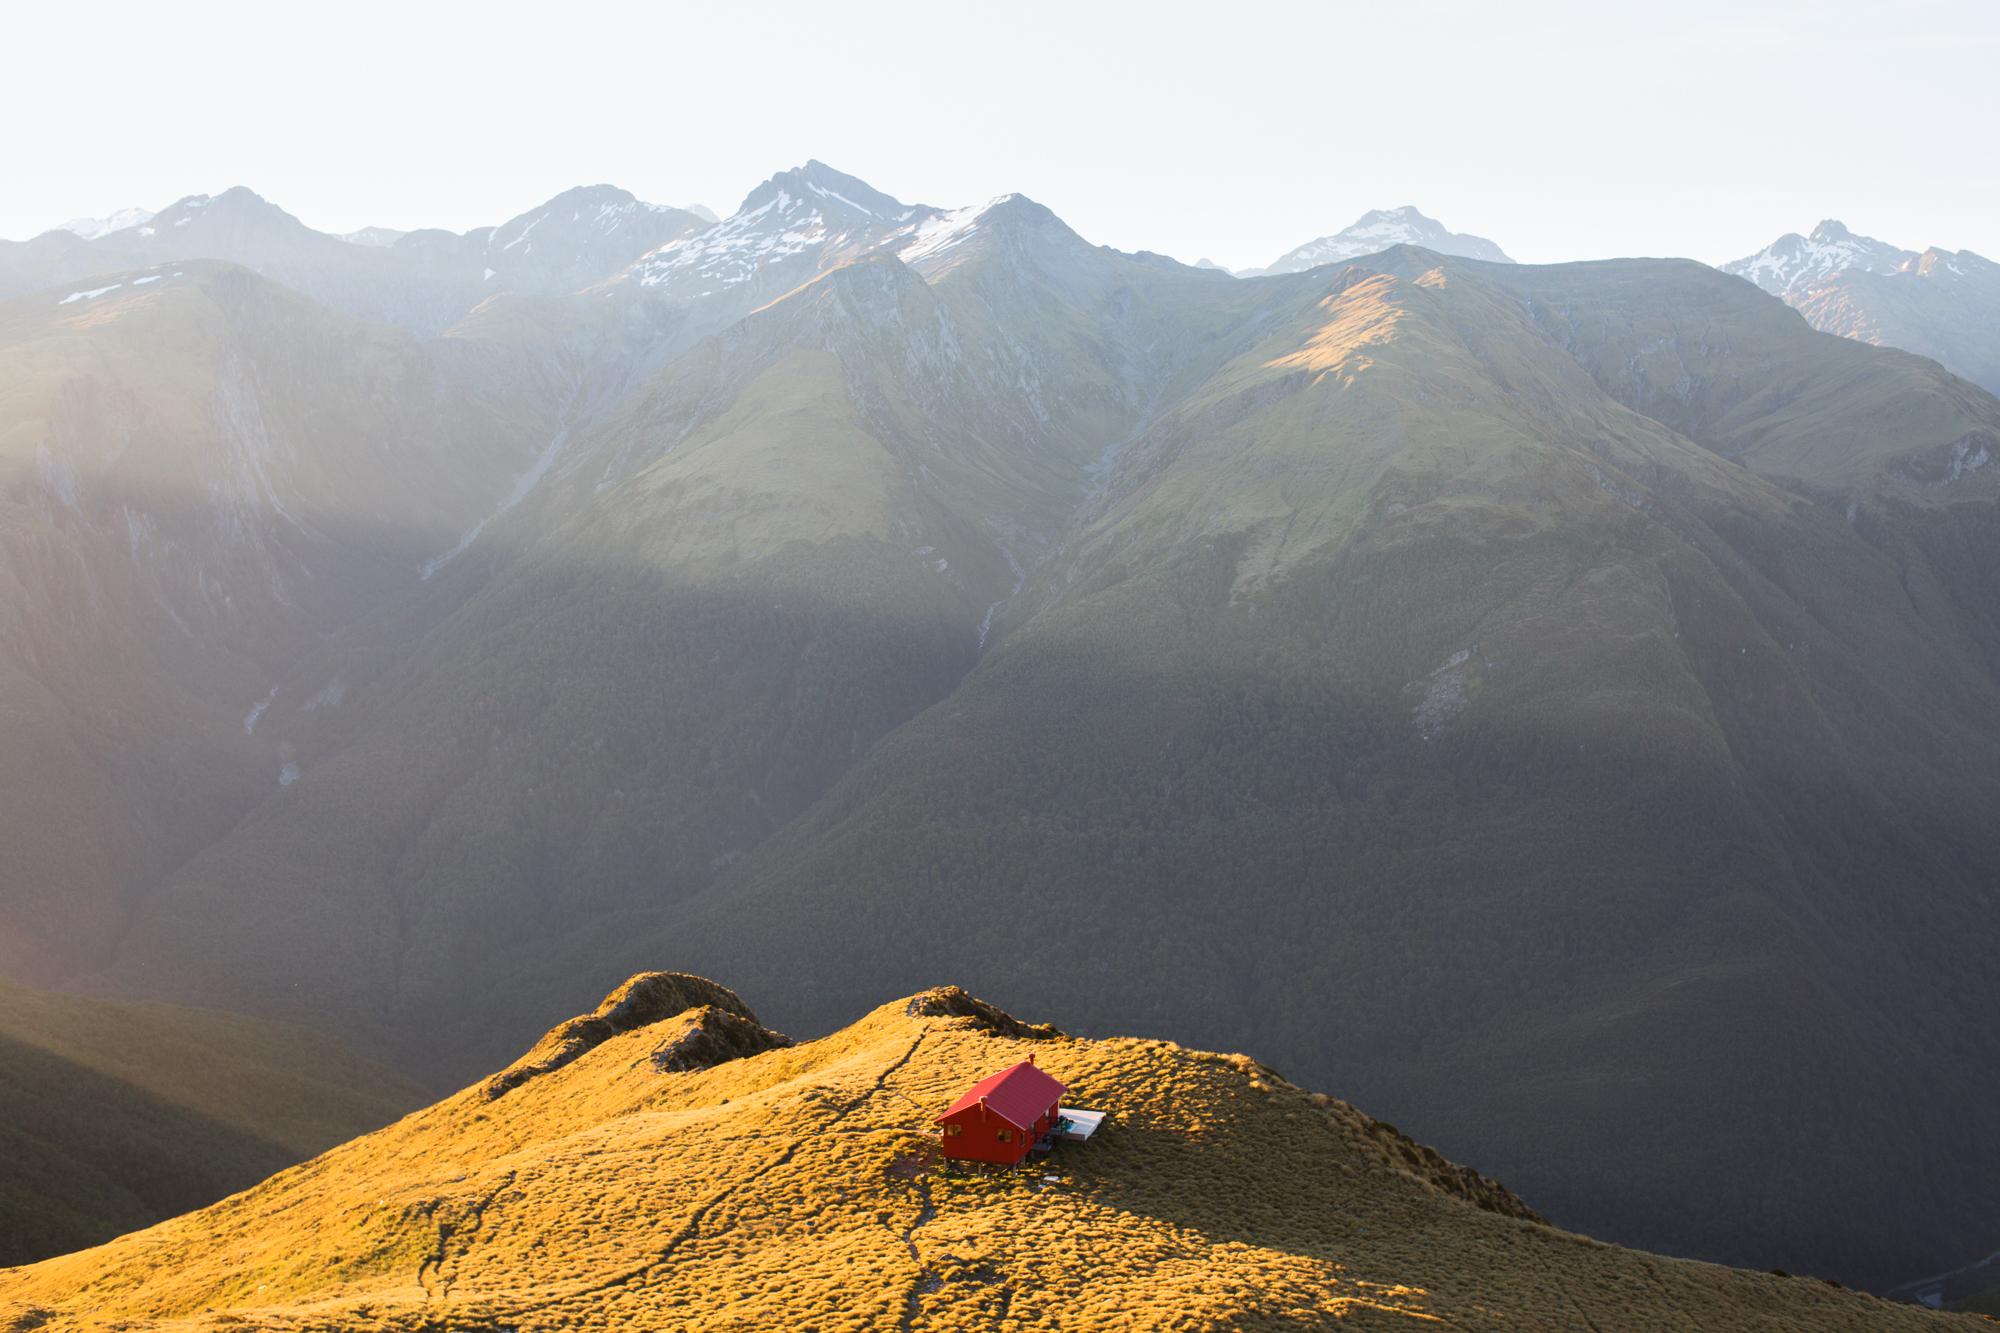 111-Bec_Kilpatrick_Photography_New_ZealandBEC_2194